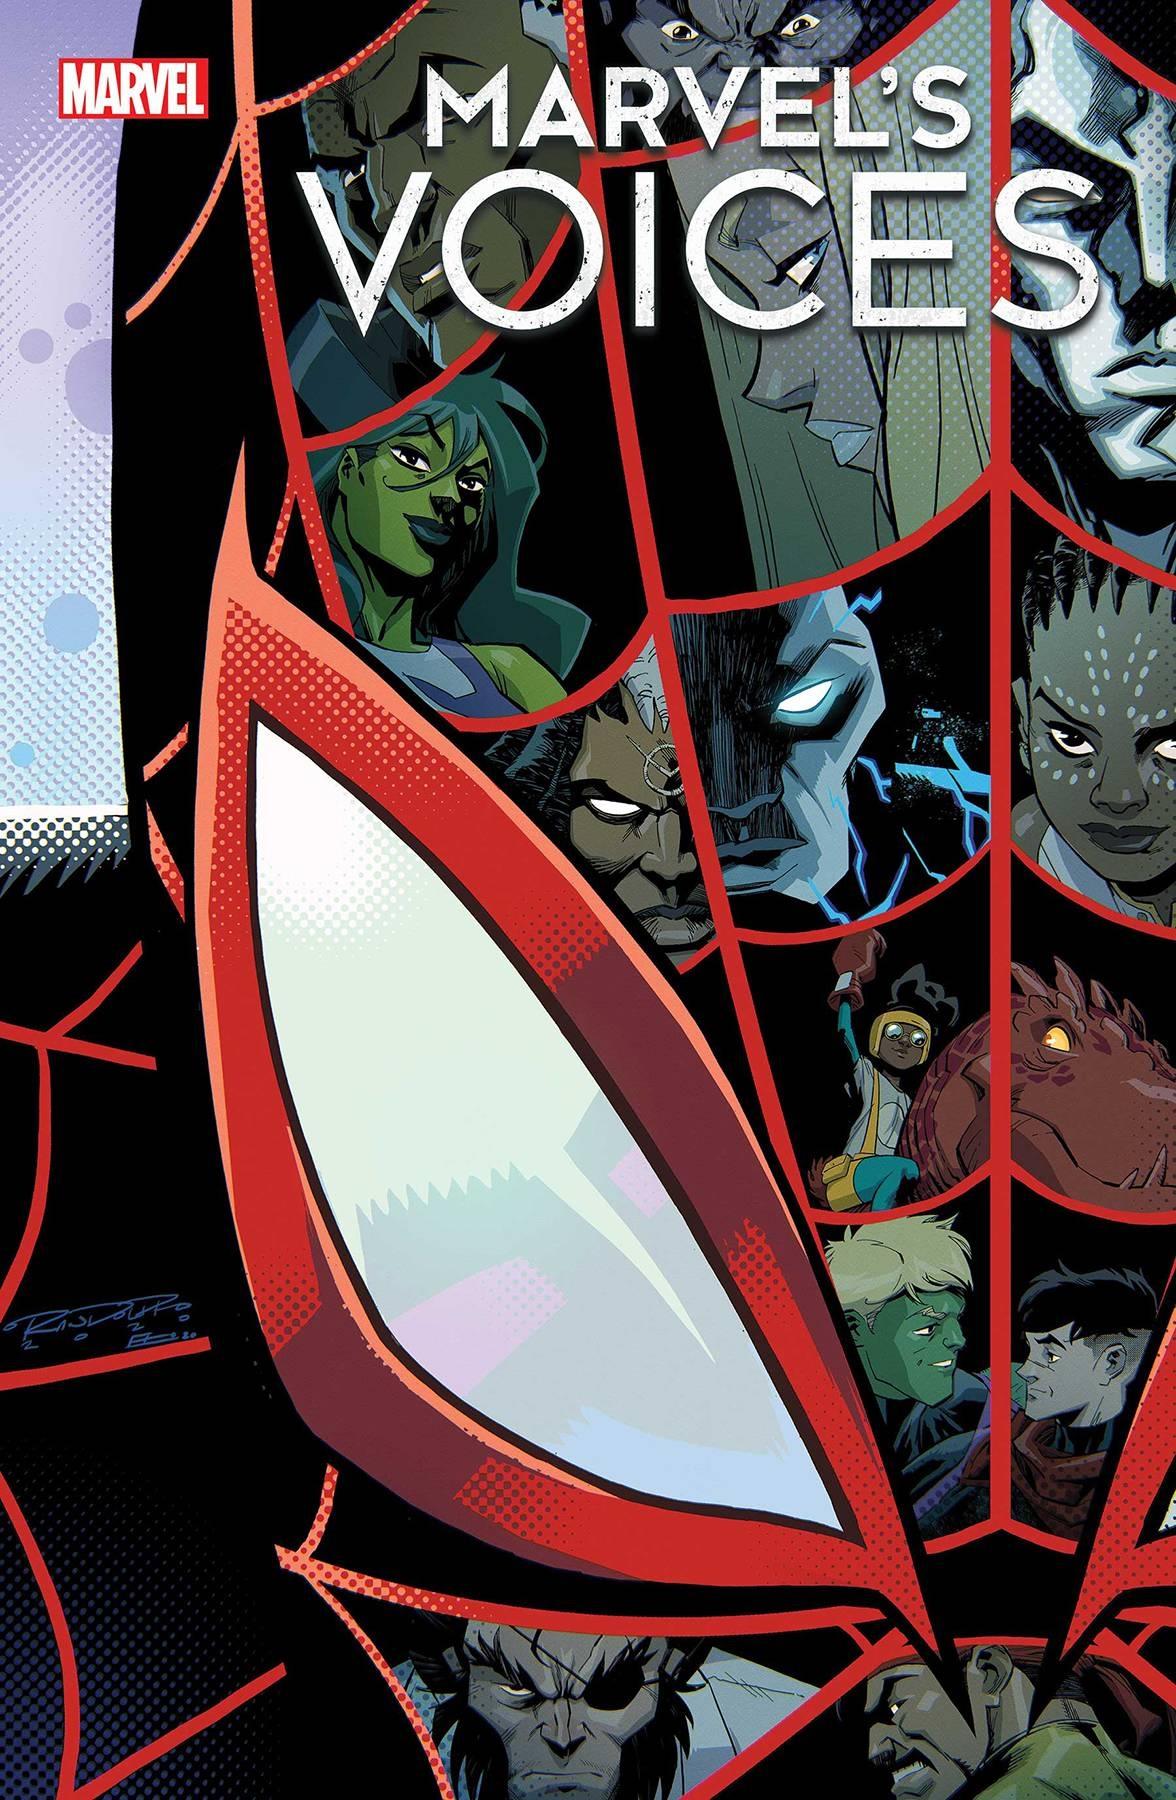 Marvel's Voices (2020) #1